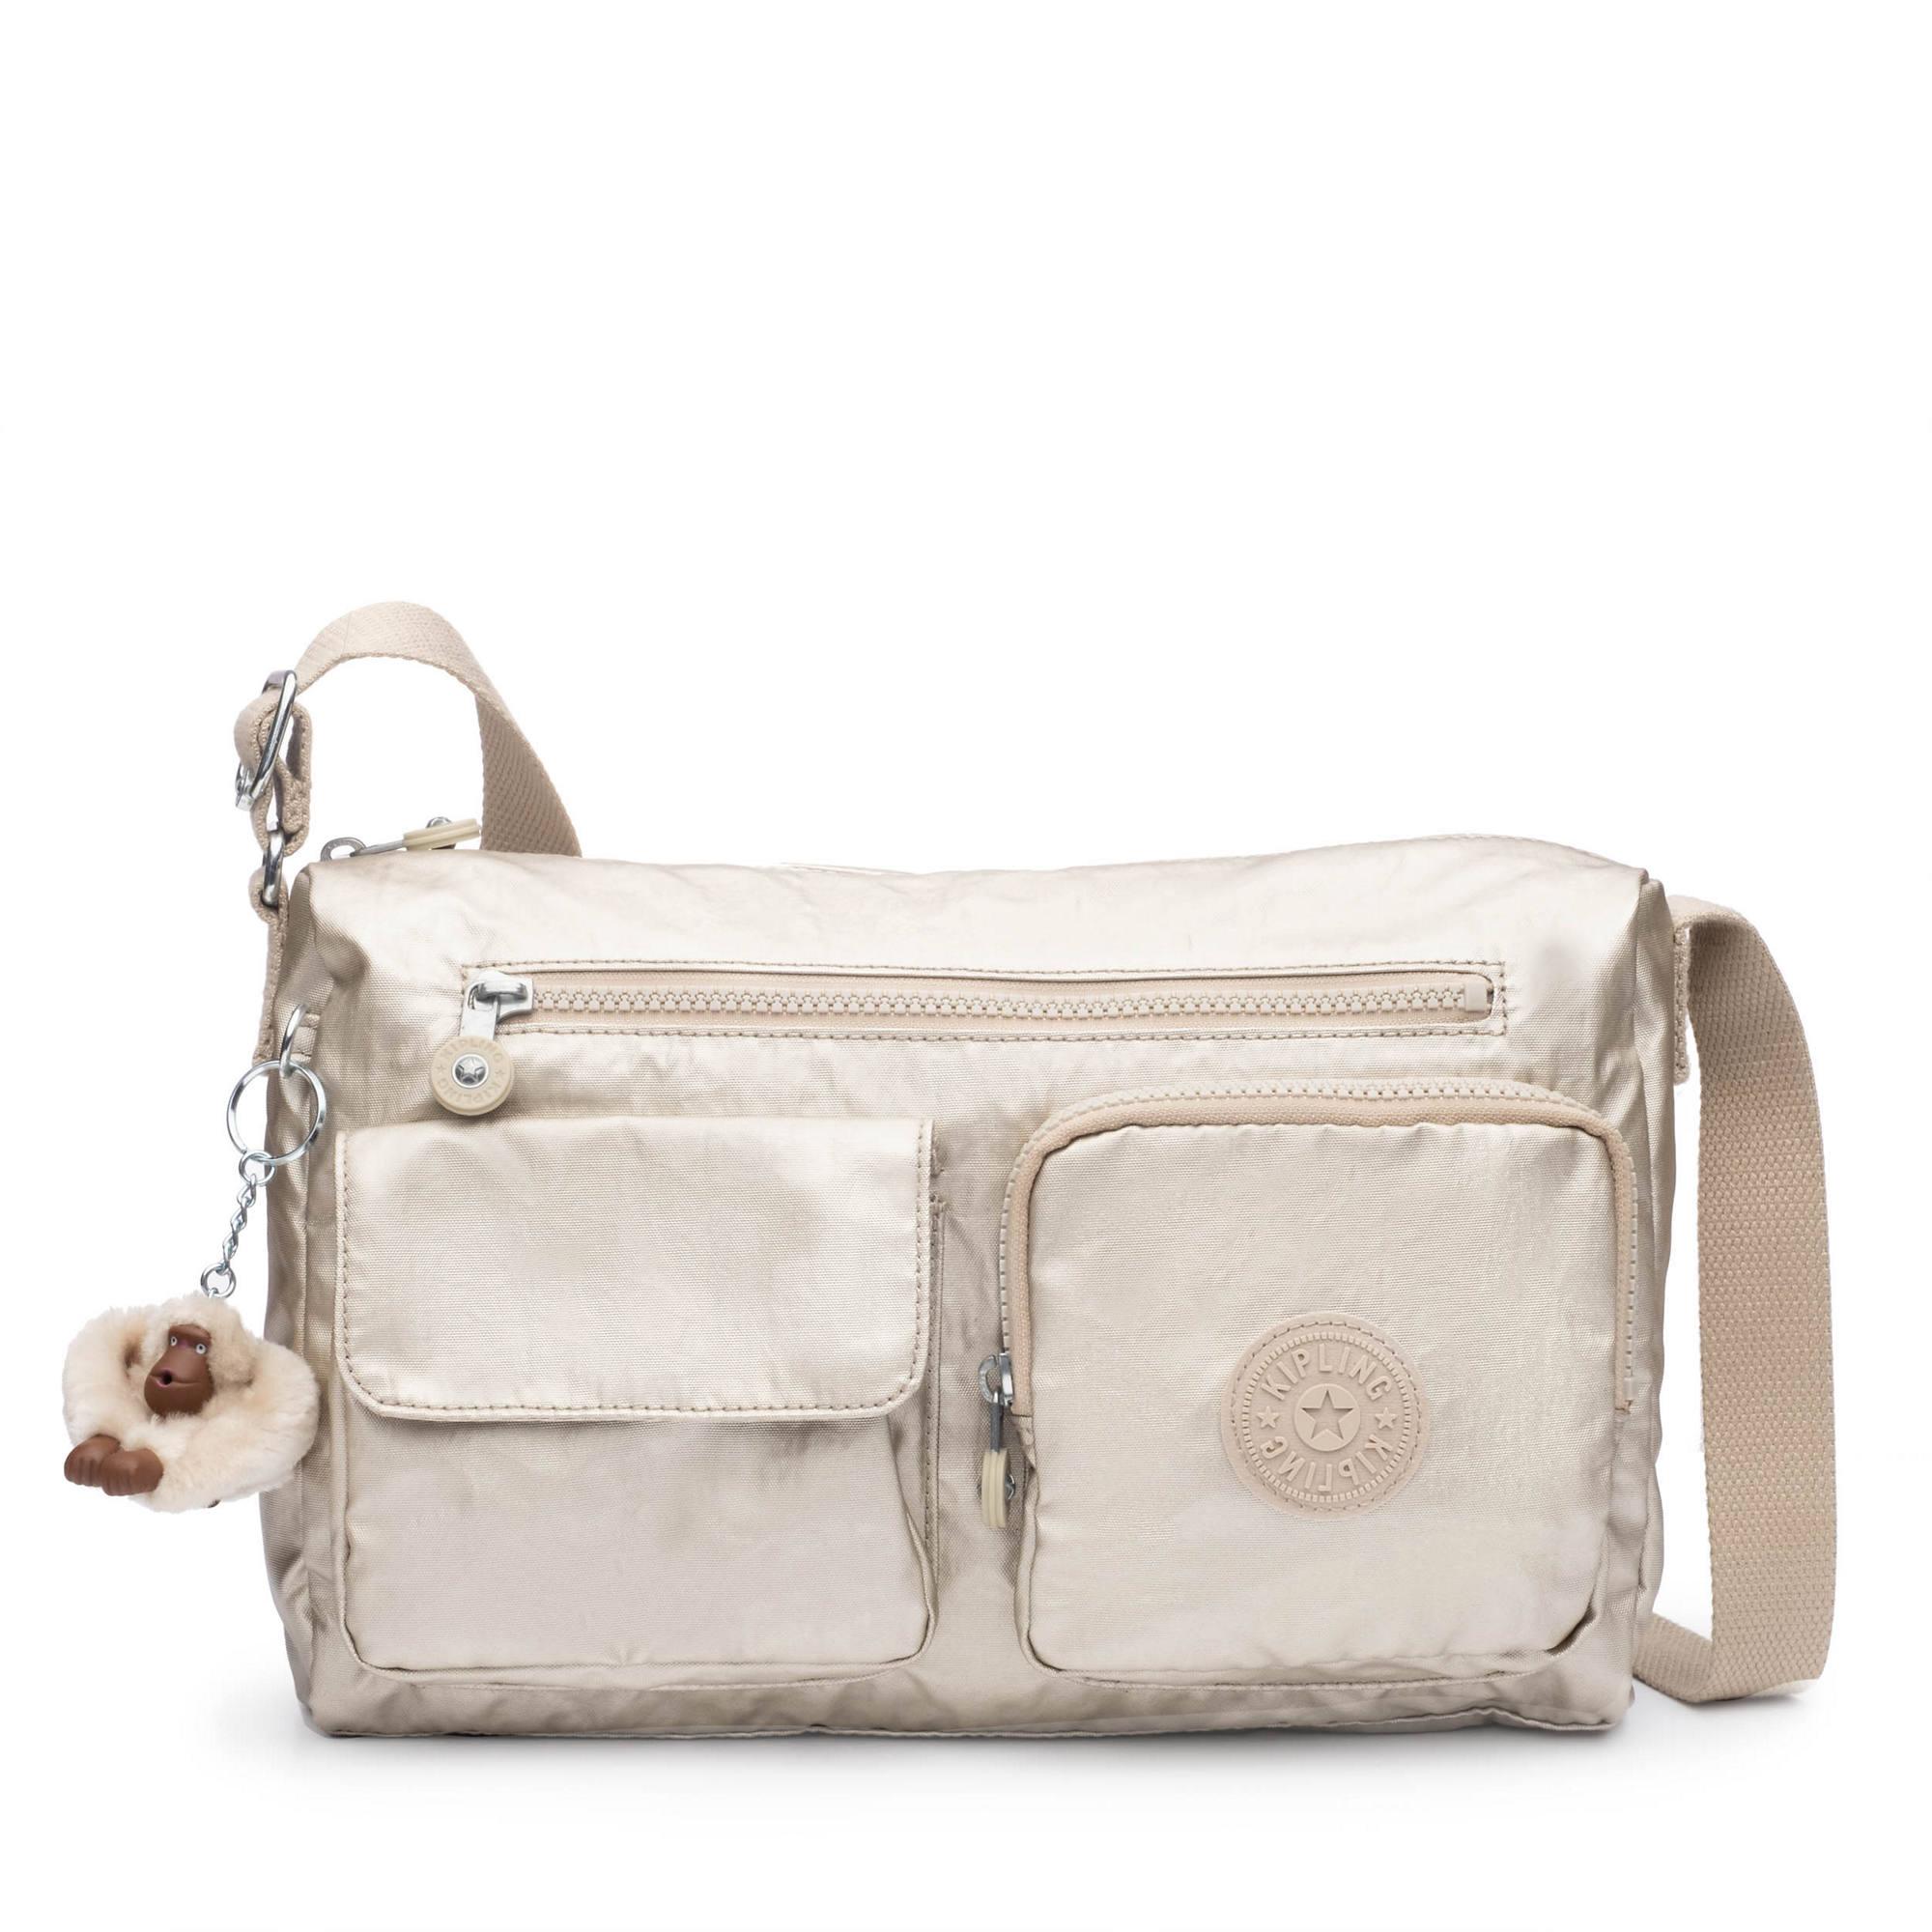 Kipling Jean Crossbody Bag